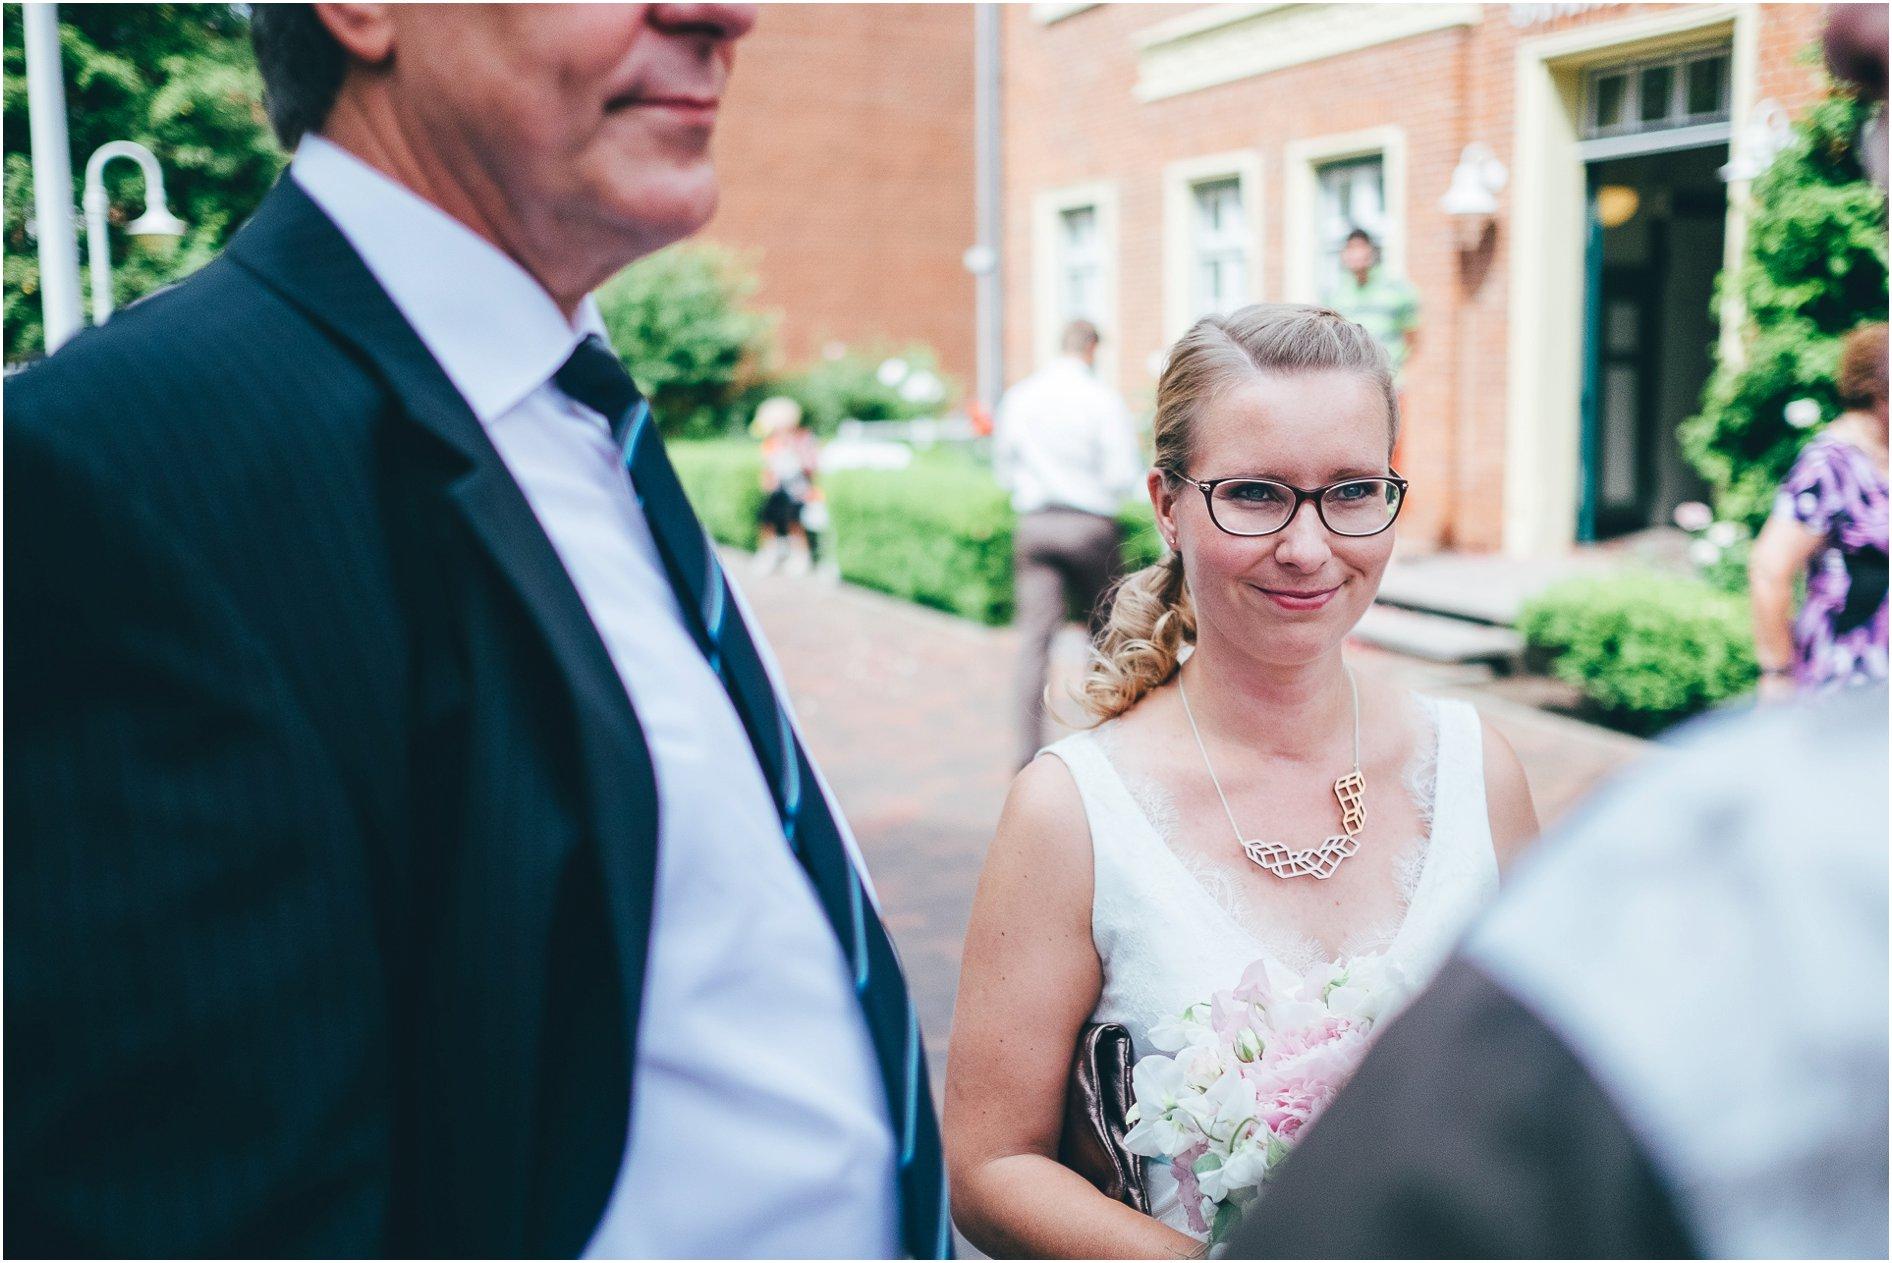 2016-04-19_0012 Sandra & Janis - Hochzeitsfotograf in Seevetal